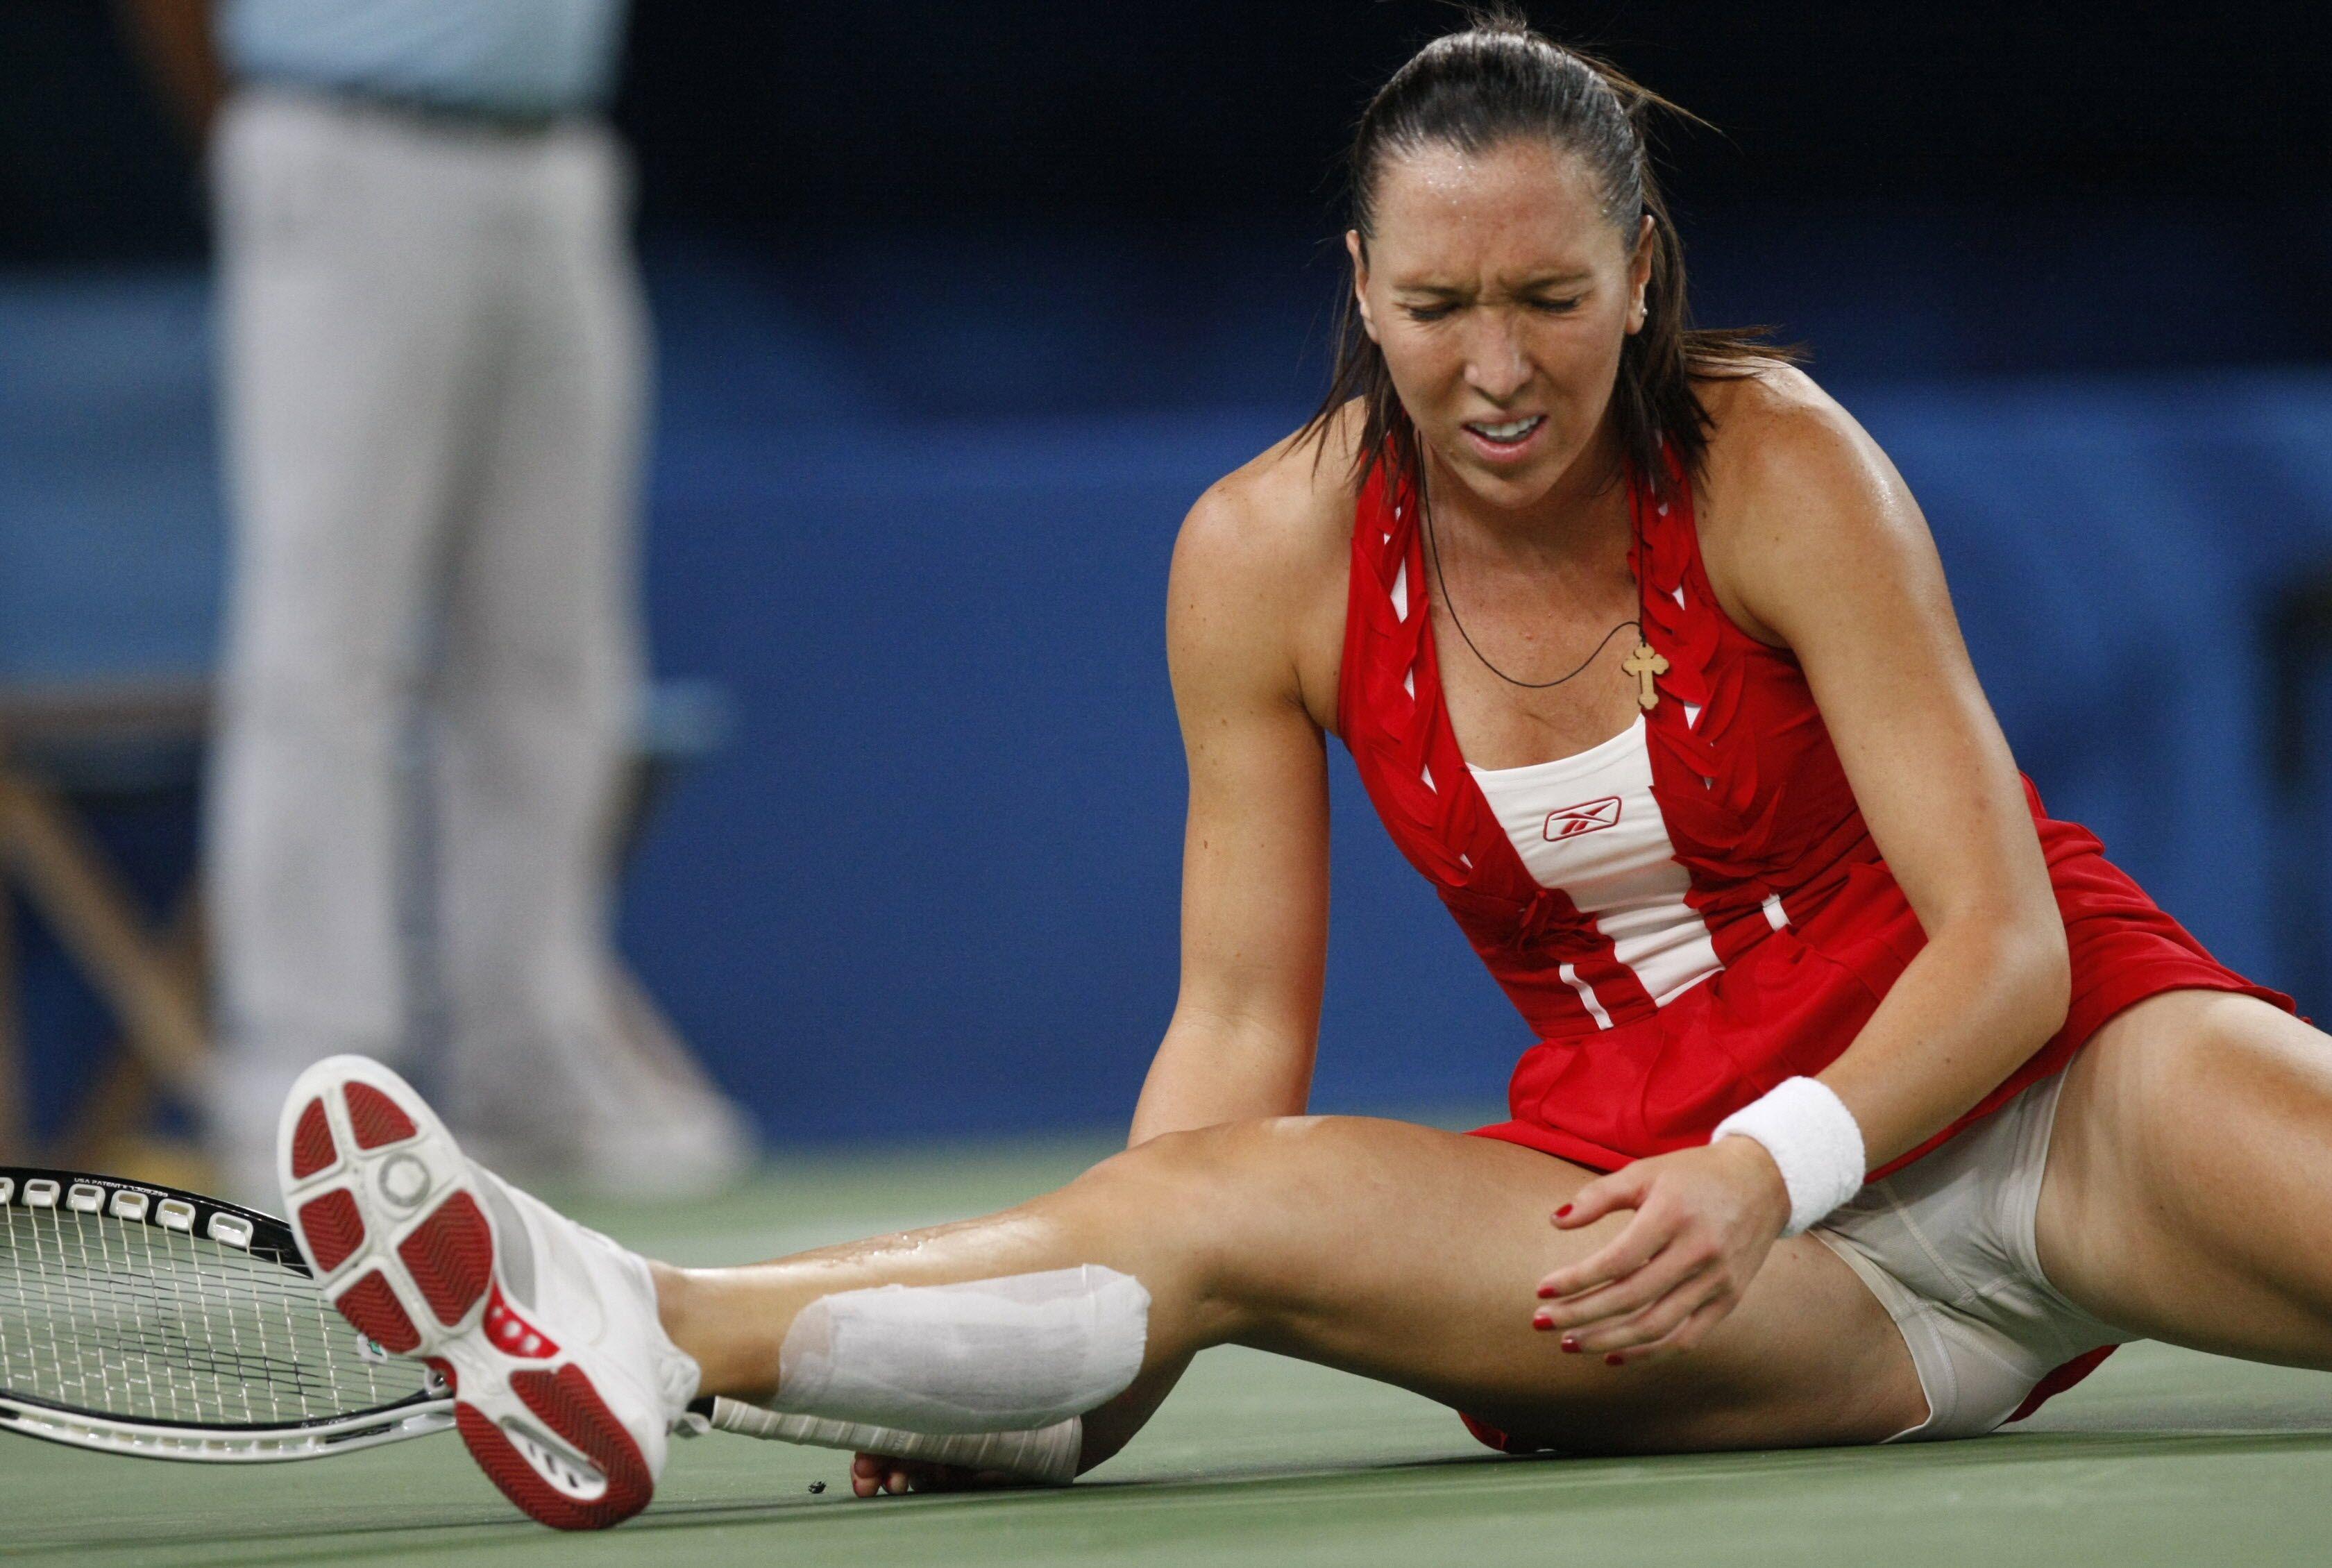 Jelena Jankovic Cameltoe Stunning jelena jankovic celebrity picture gallery   les belles du tennis